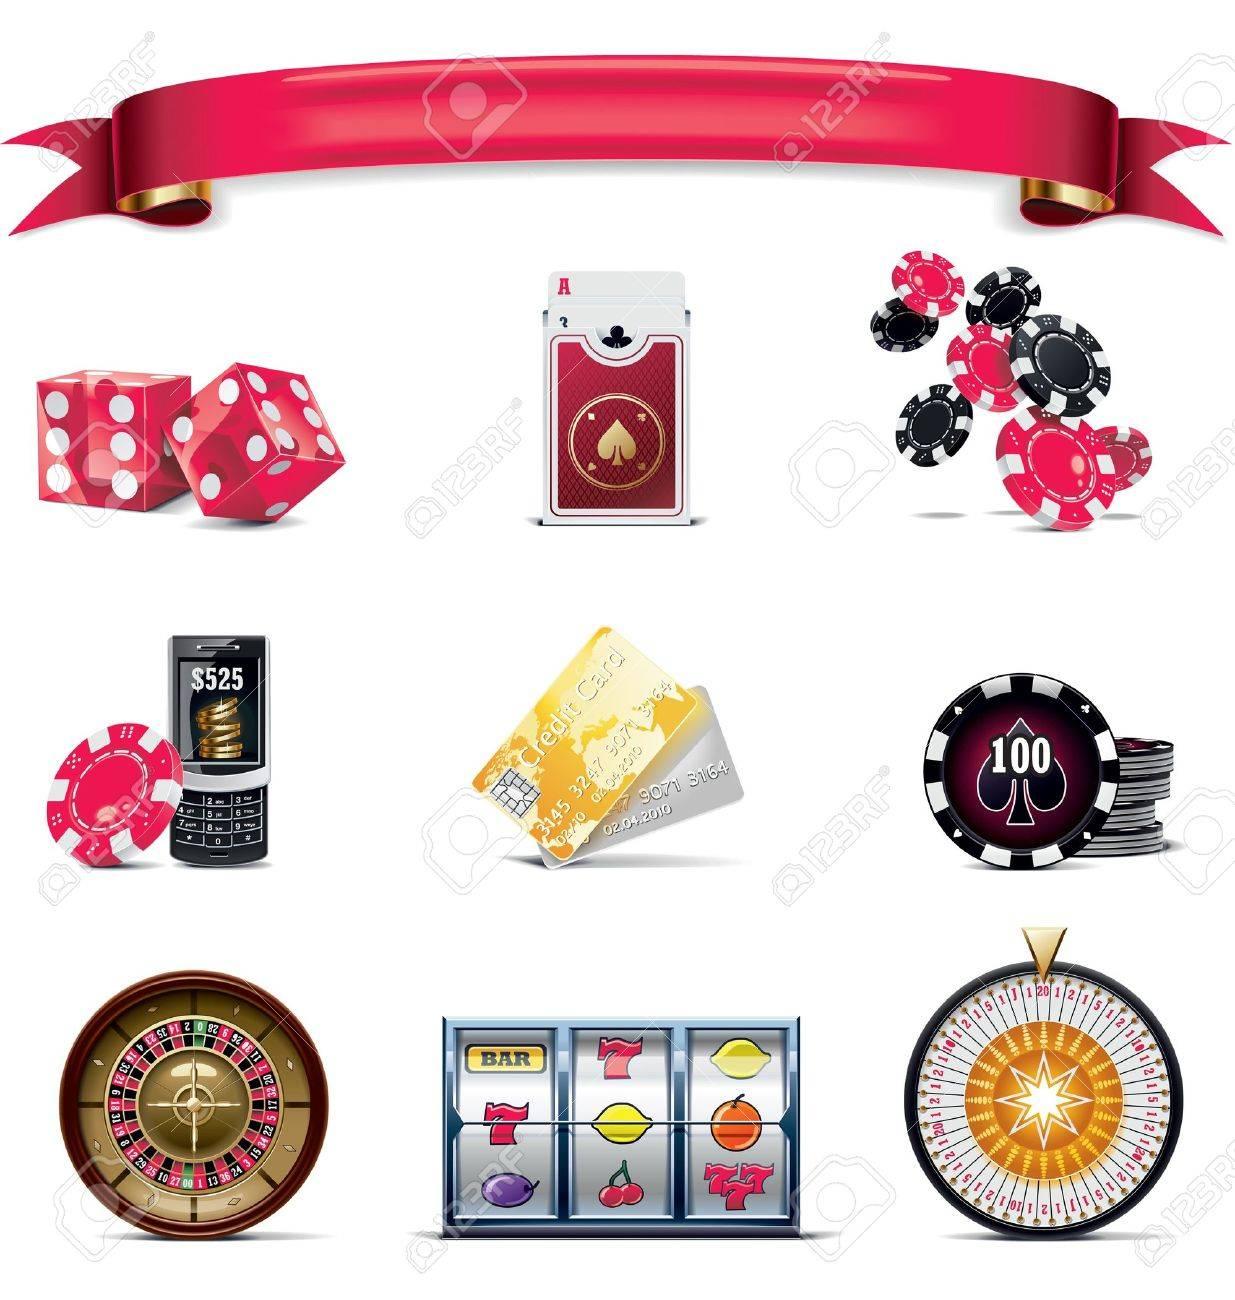 2bnet 2bon casino sunway hotel u0026 casino morrocoy